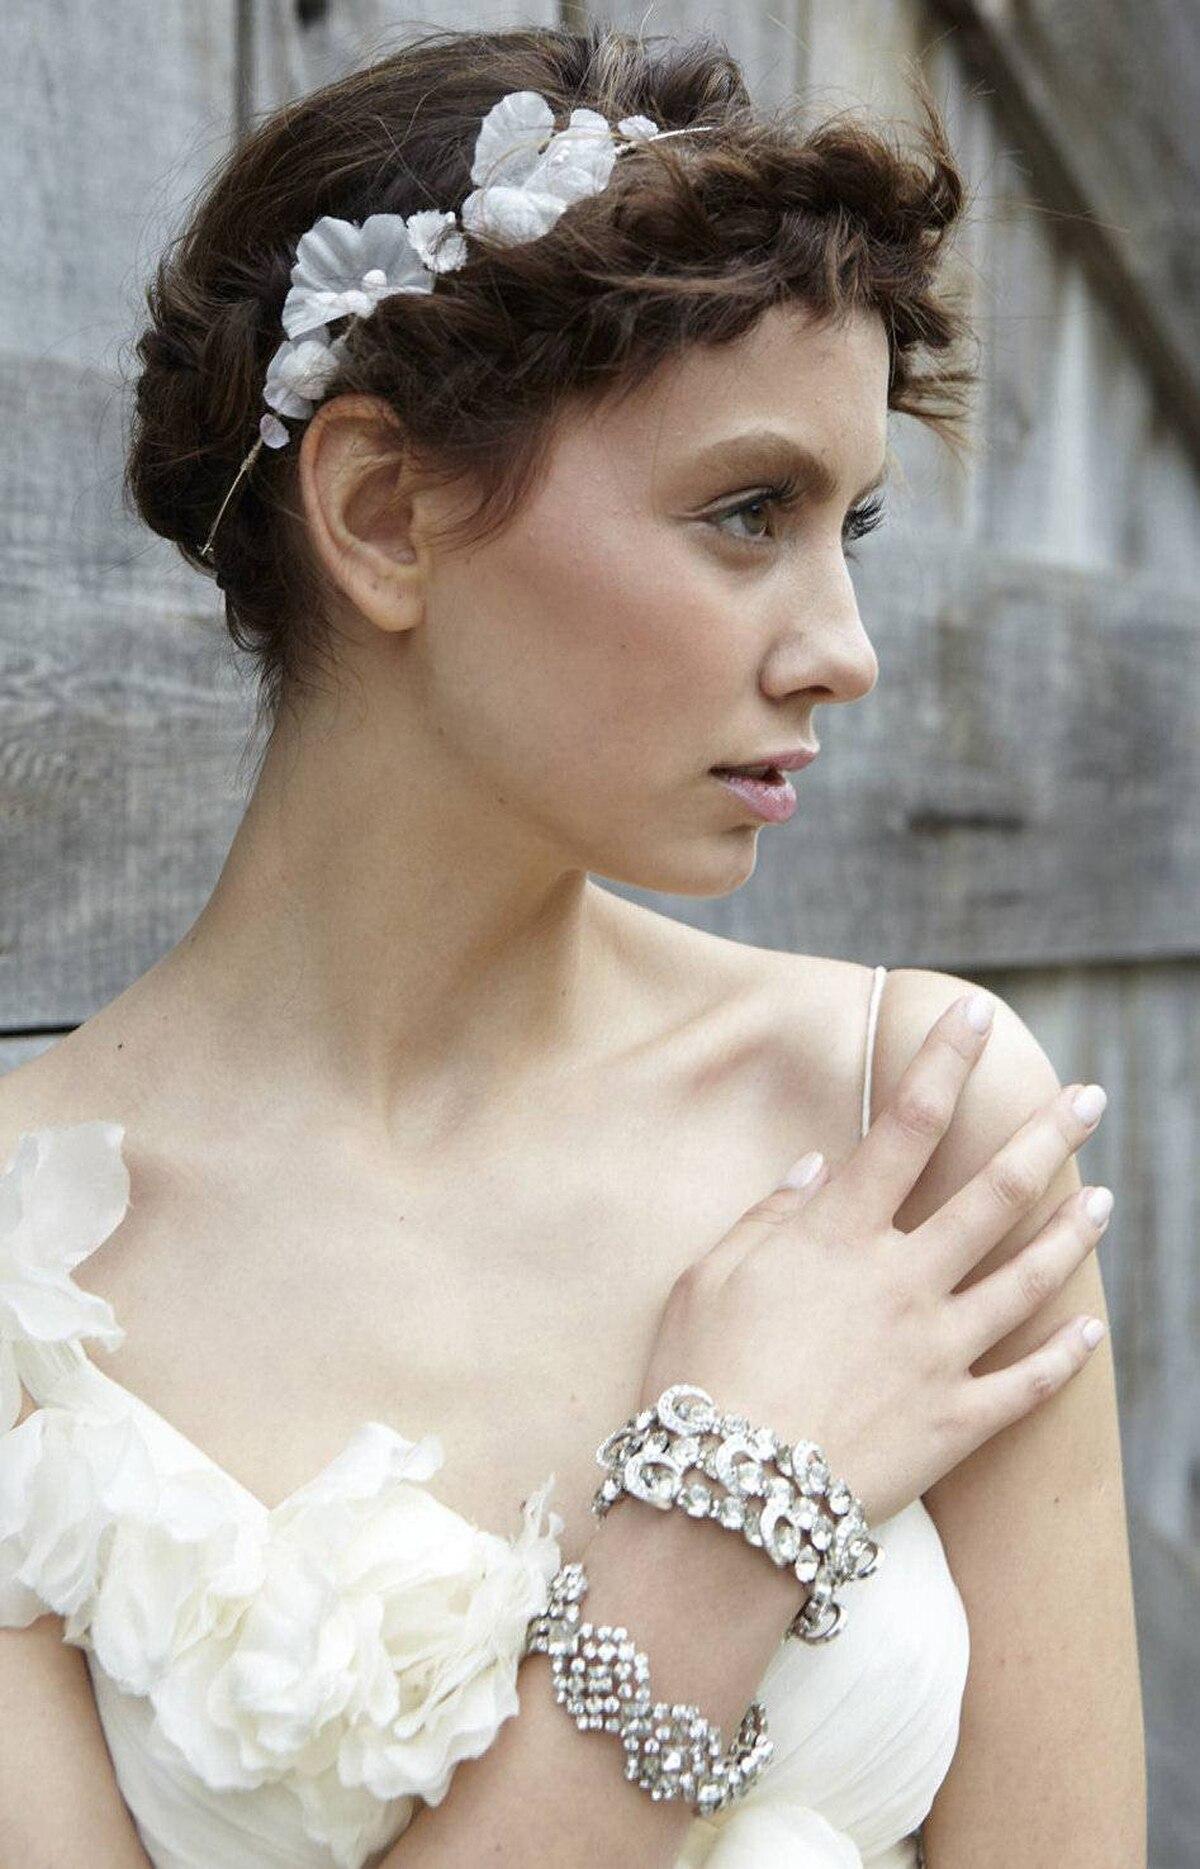 Carole Tanenbaum bracelets, $550 and $350, floral headpiece, $350 at White Toronto (www.whitetoronto.com).